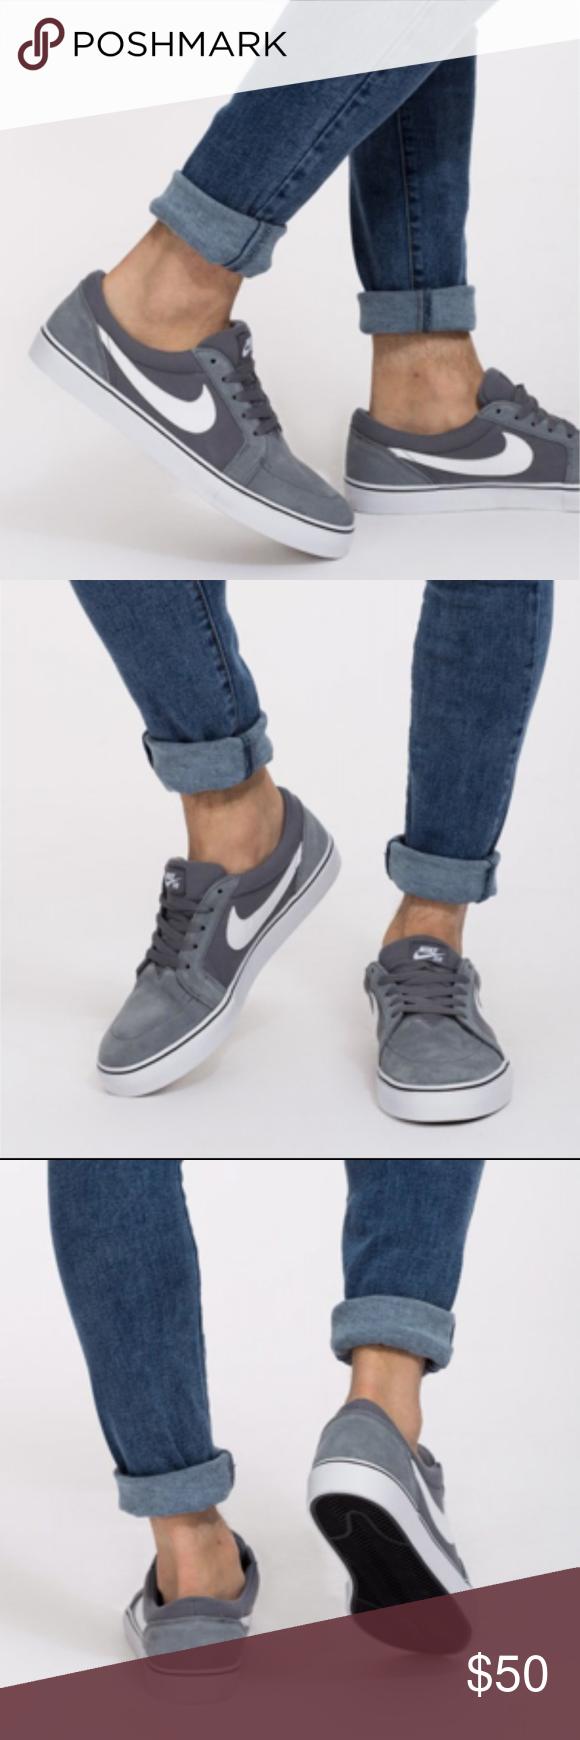 Nike Sb Satire Ii Men S Suede Skateboarding Shoes The Nike Sb